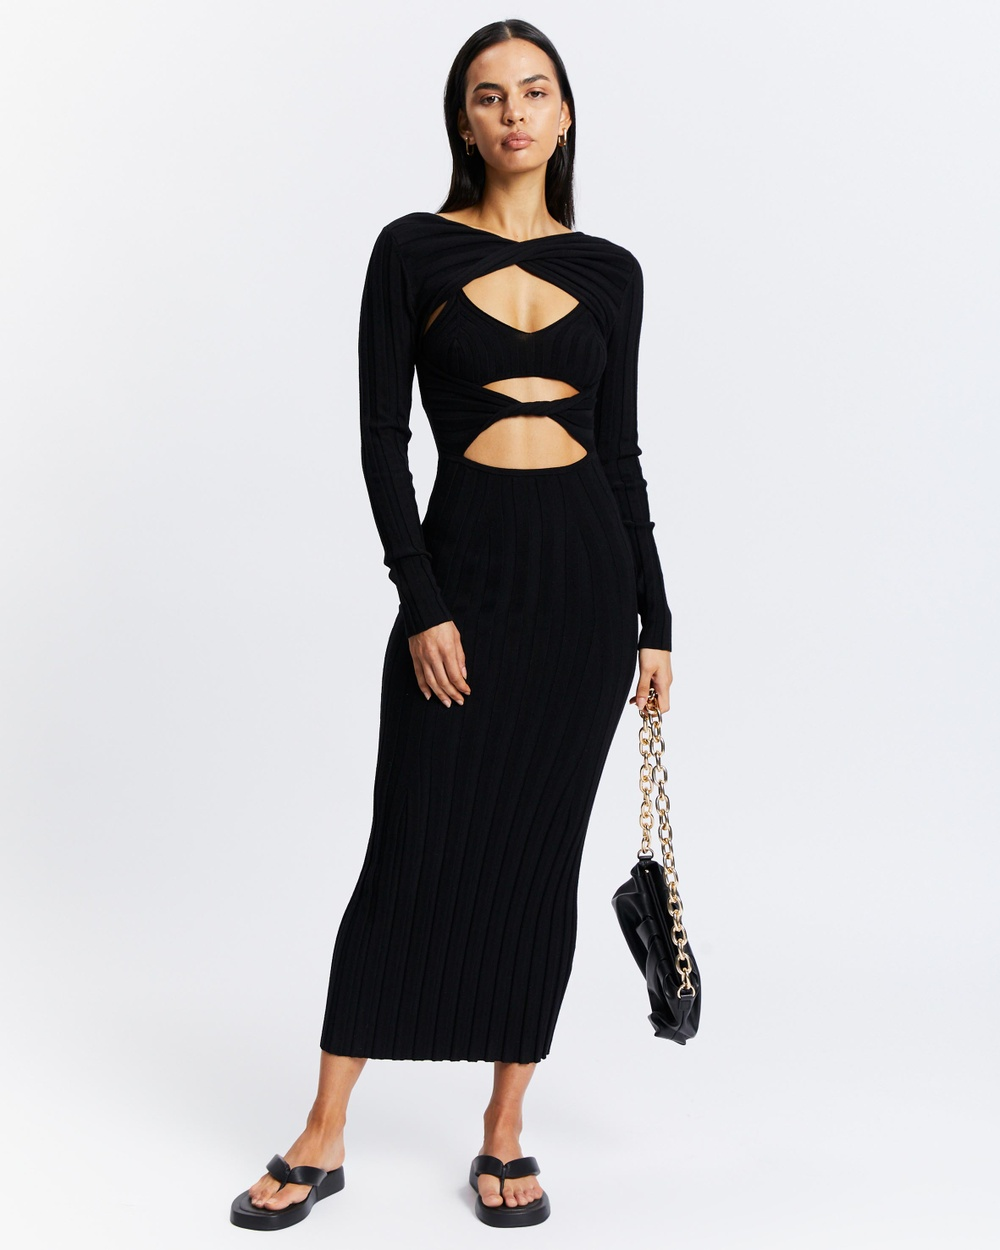 AERE Long Sleeve Knit Dress Bodycon Dresses Black